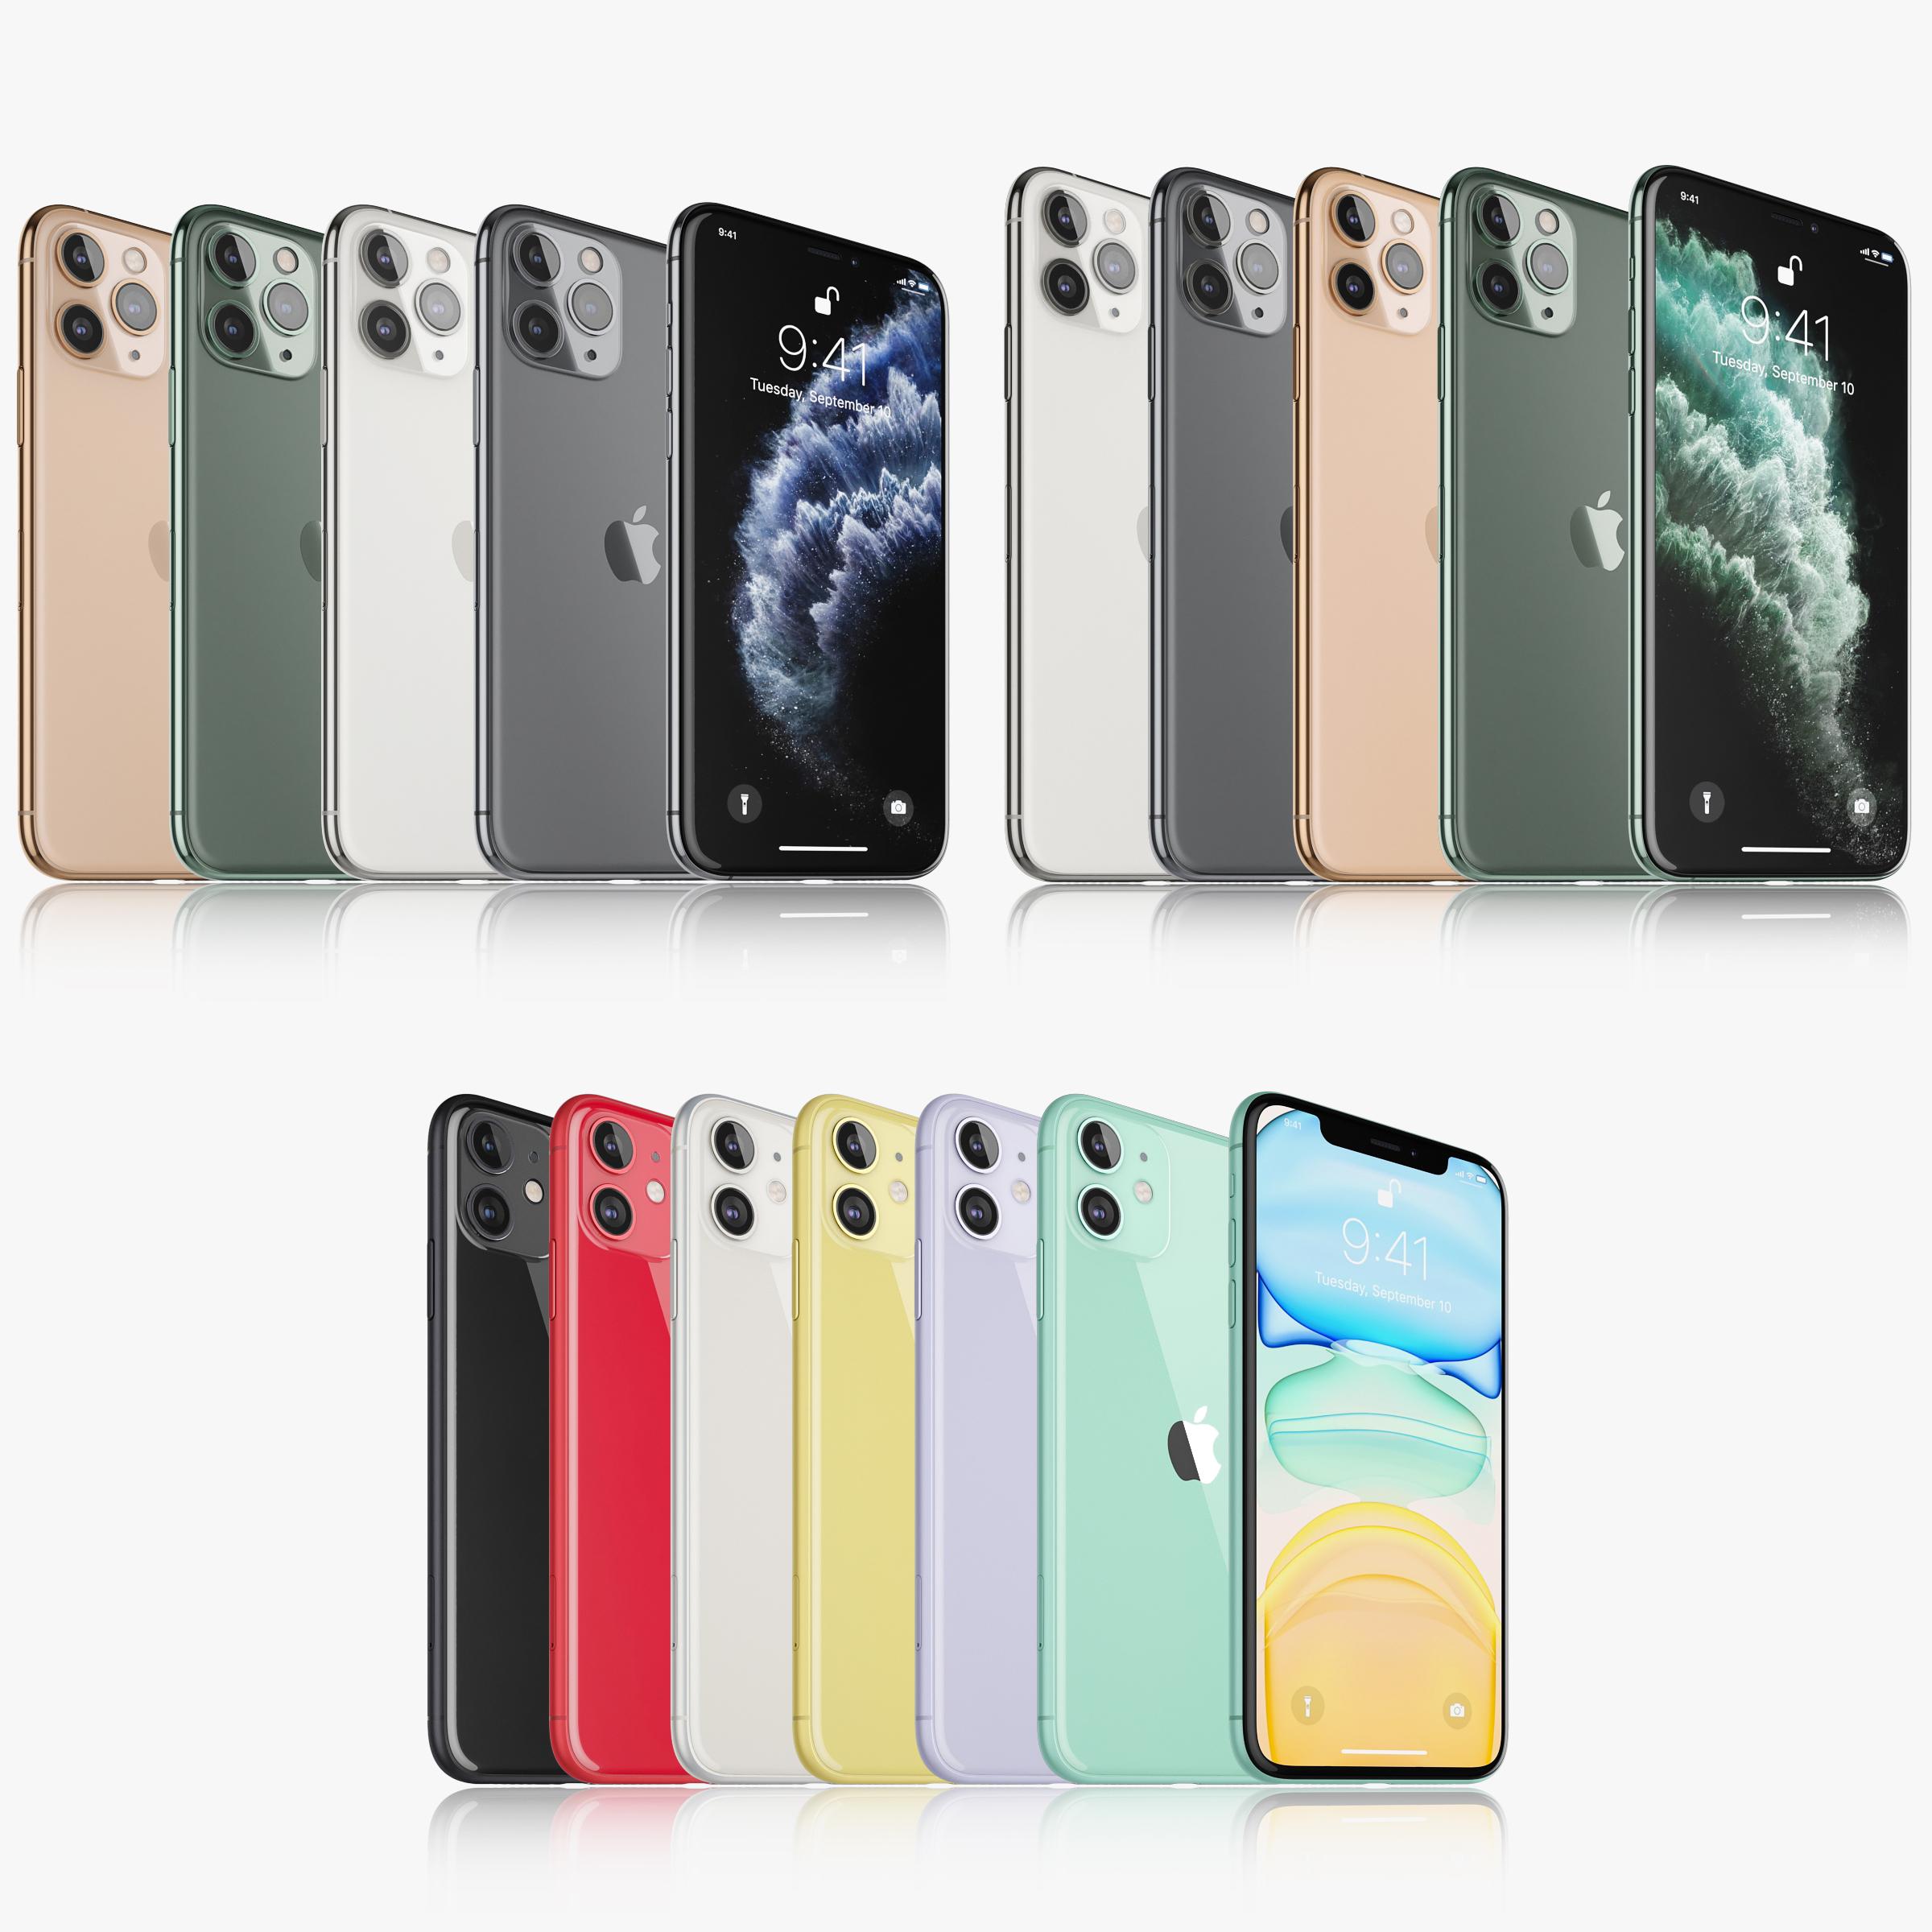 Apple iPhone 11 Pro \u0026 11 Pro MAX \u0026 11 All colors